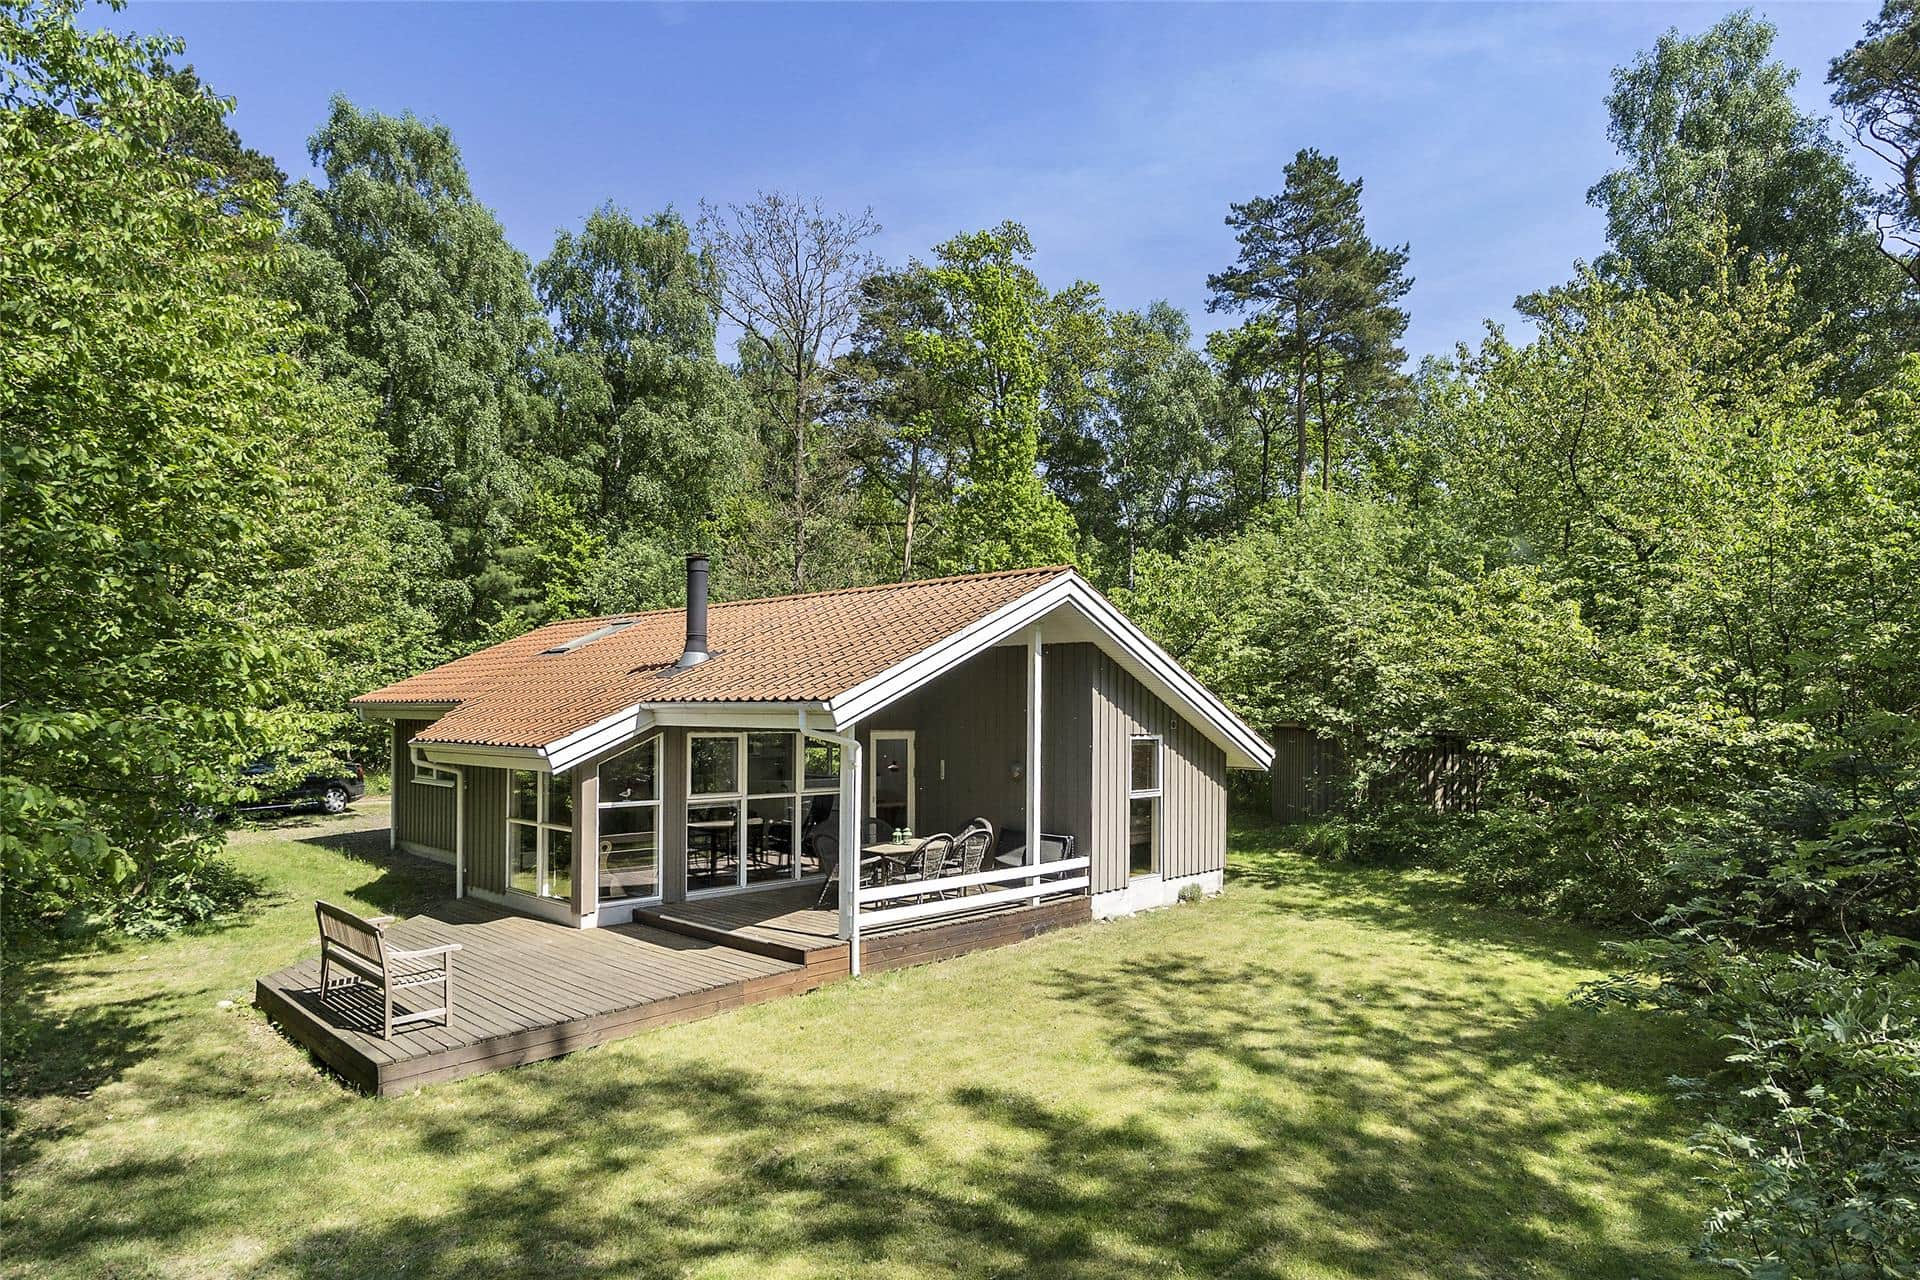 Bild 1-10 Ferienhaus 6710, Skovkanten 36, DK - 3790 Hasle